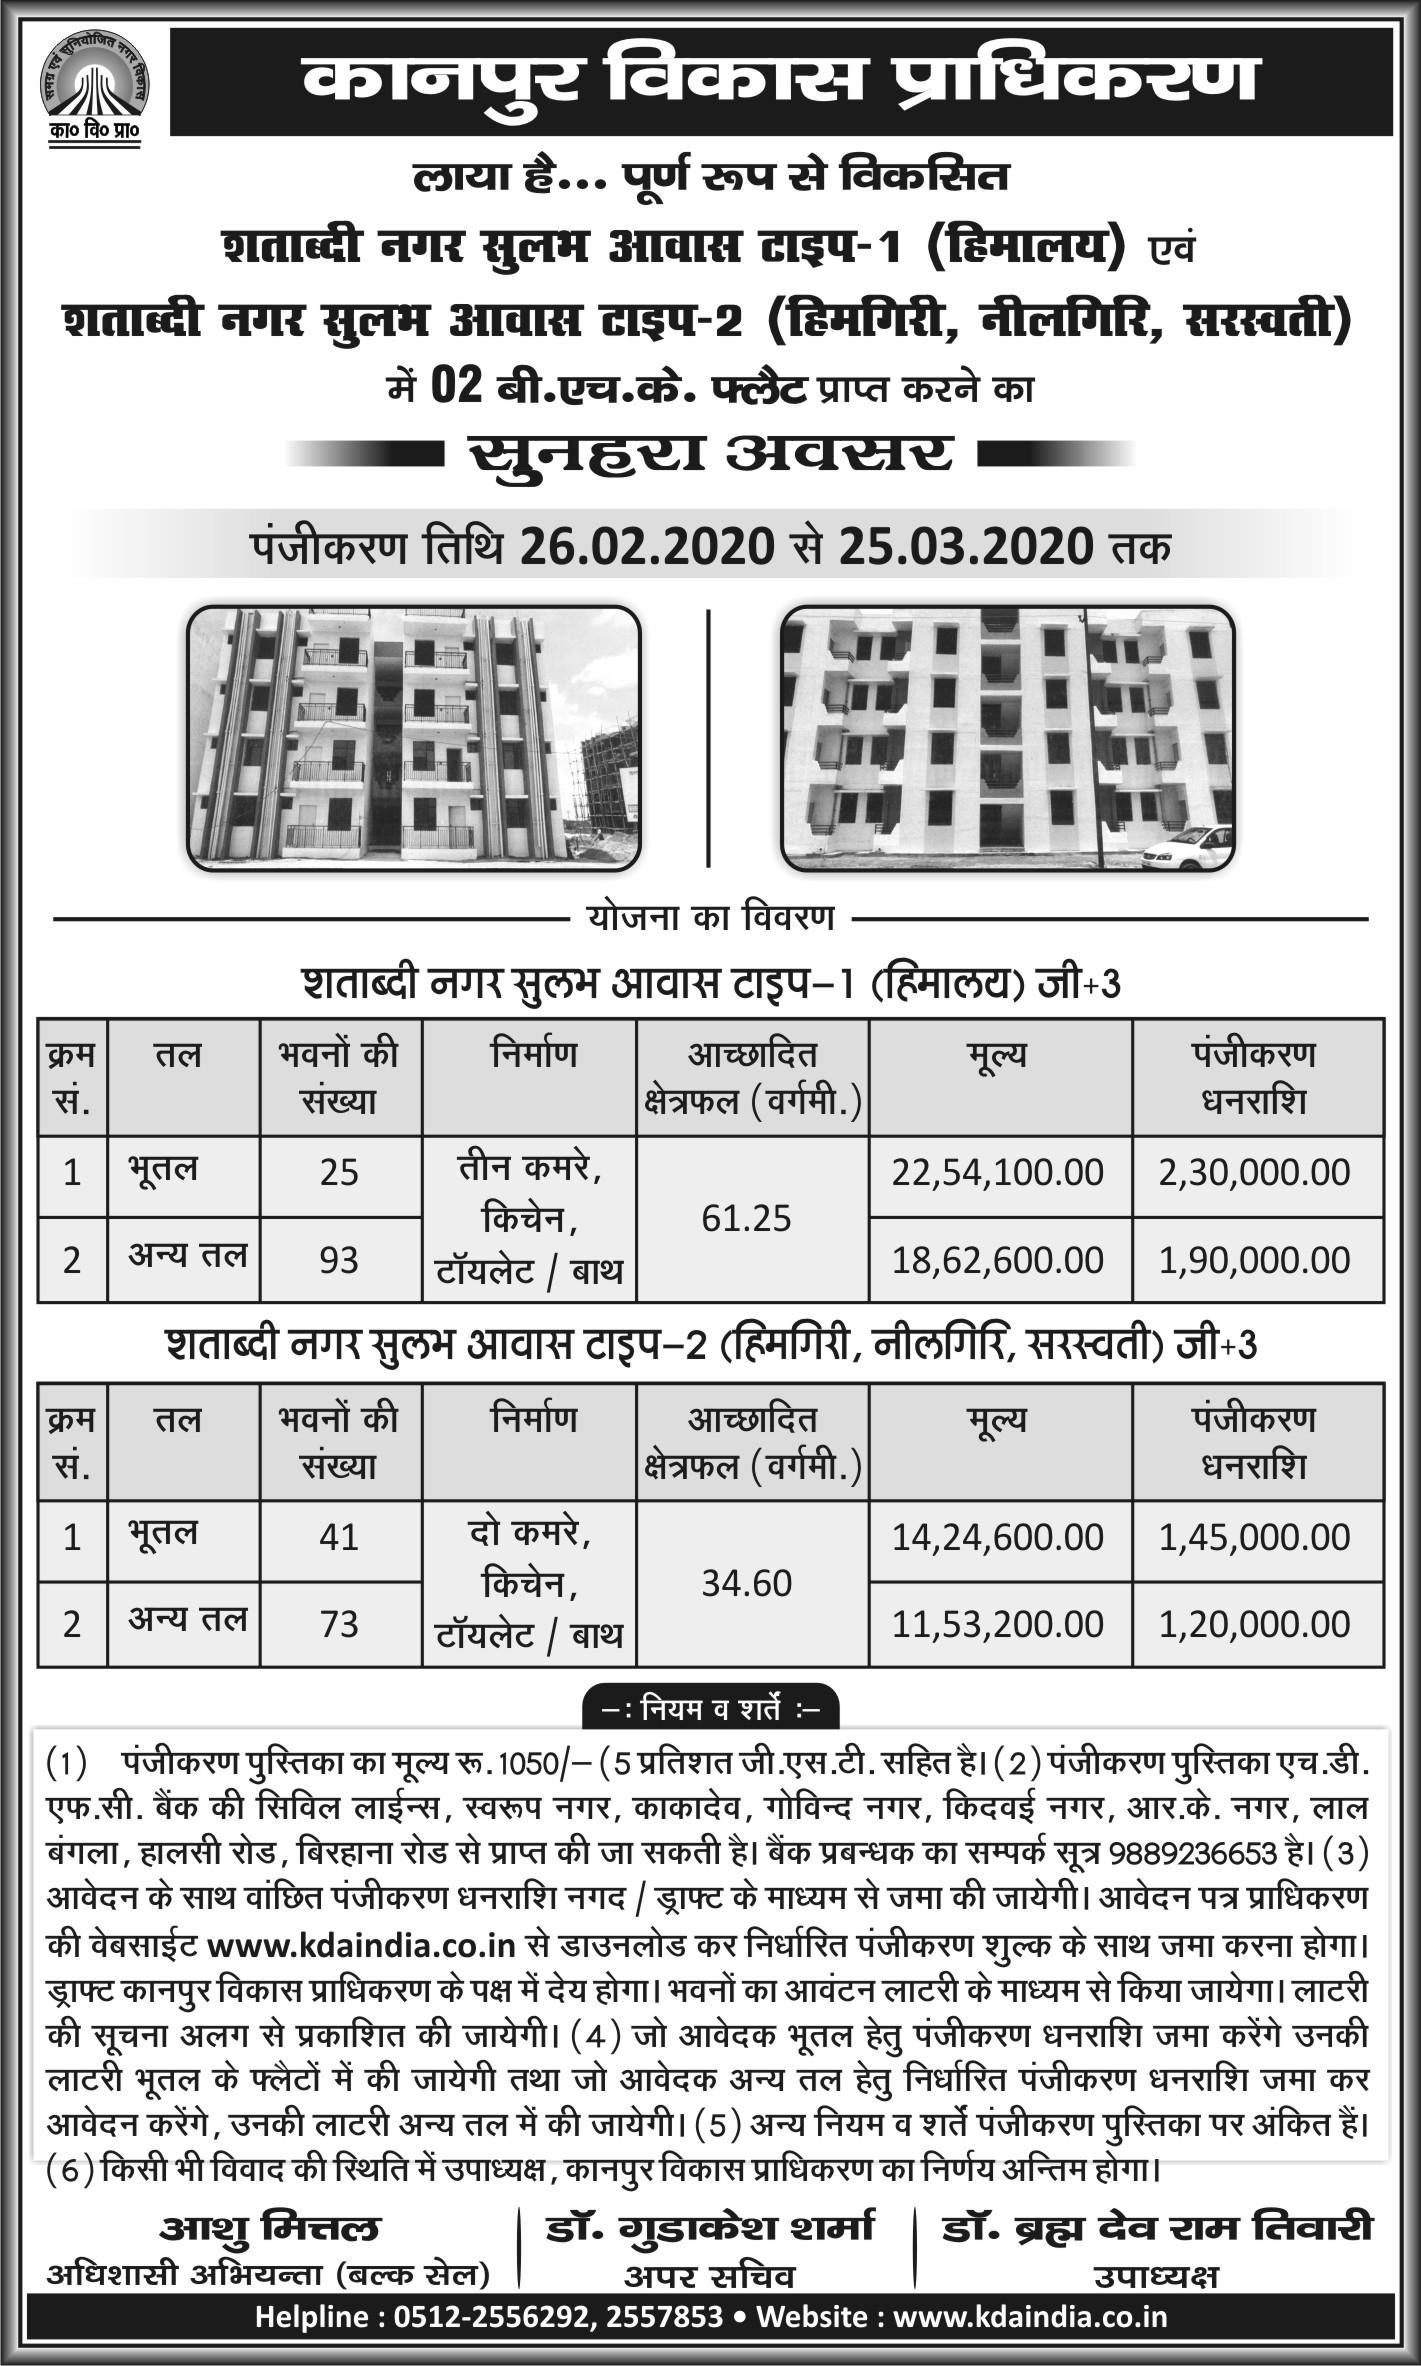 Kanpur Development Authority